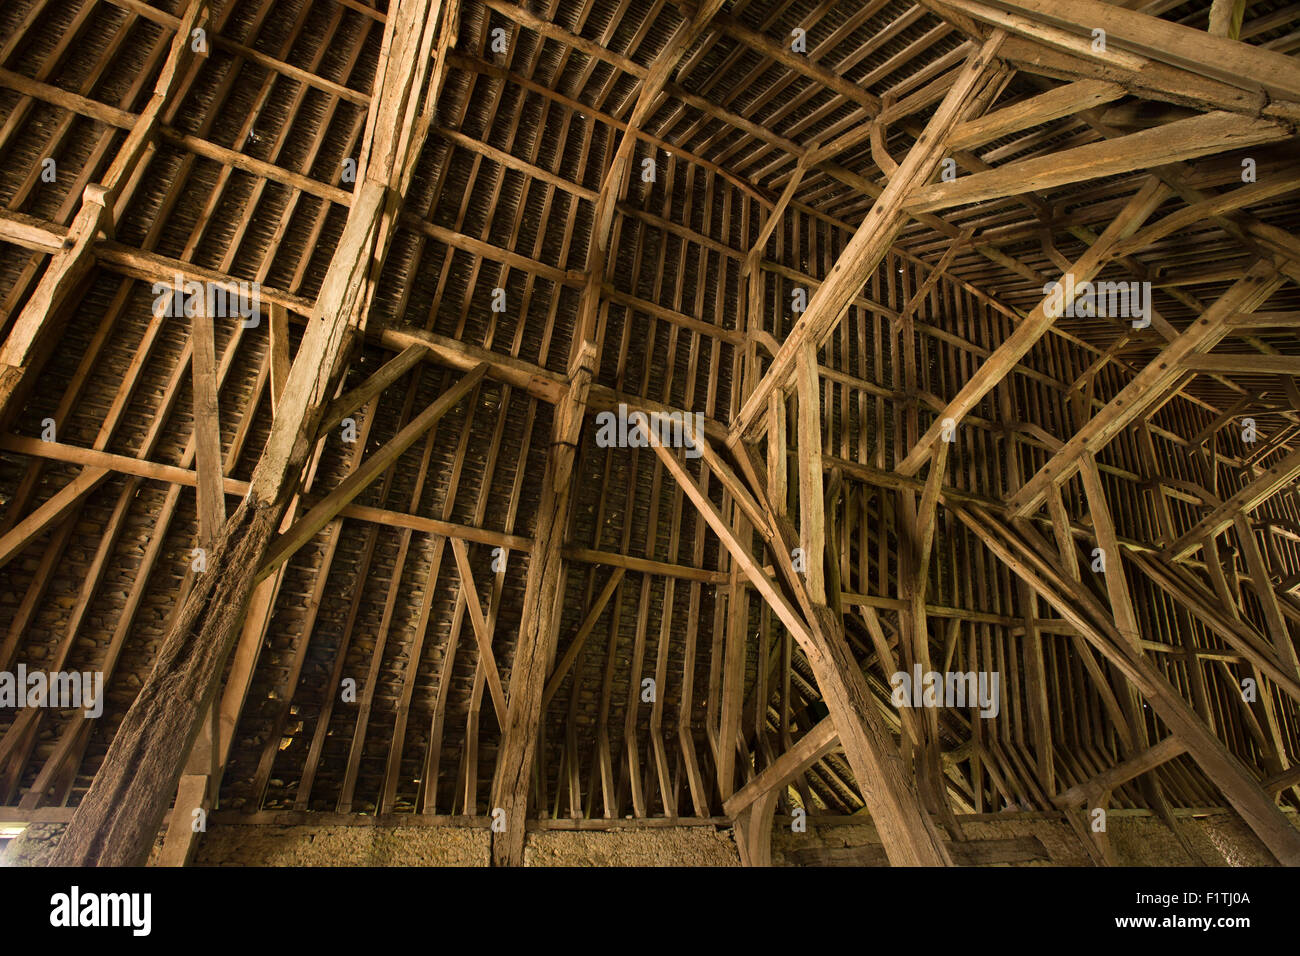 Barn Interior uk, oxfordshire, faringdon, great coxwell, 14th century tithe barn